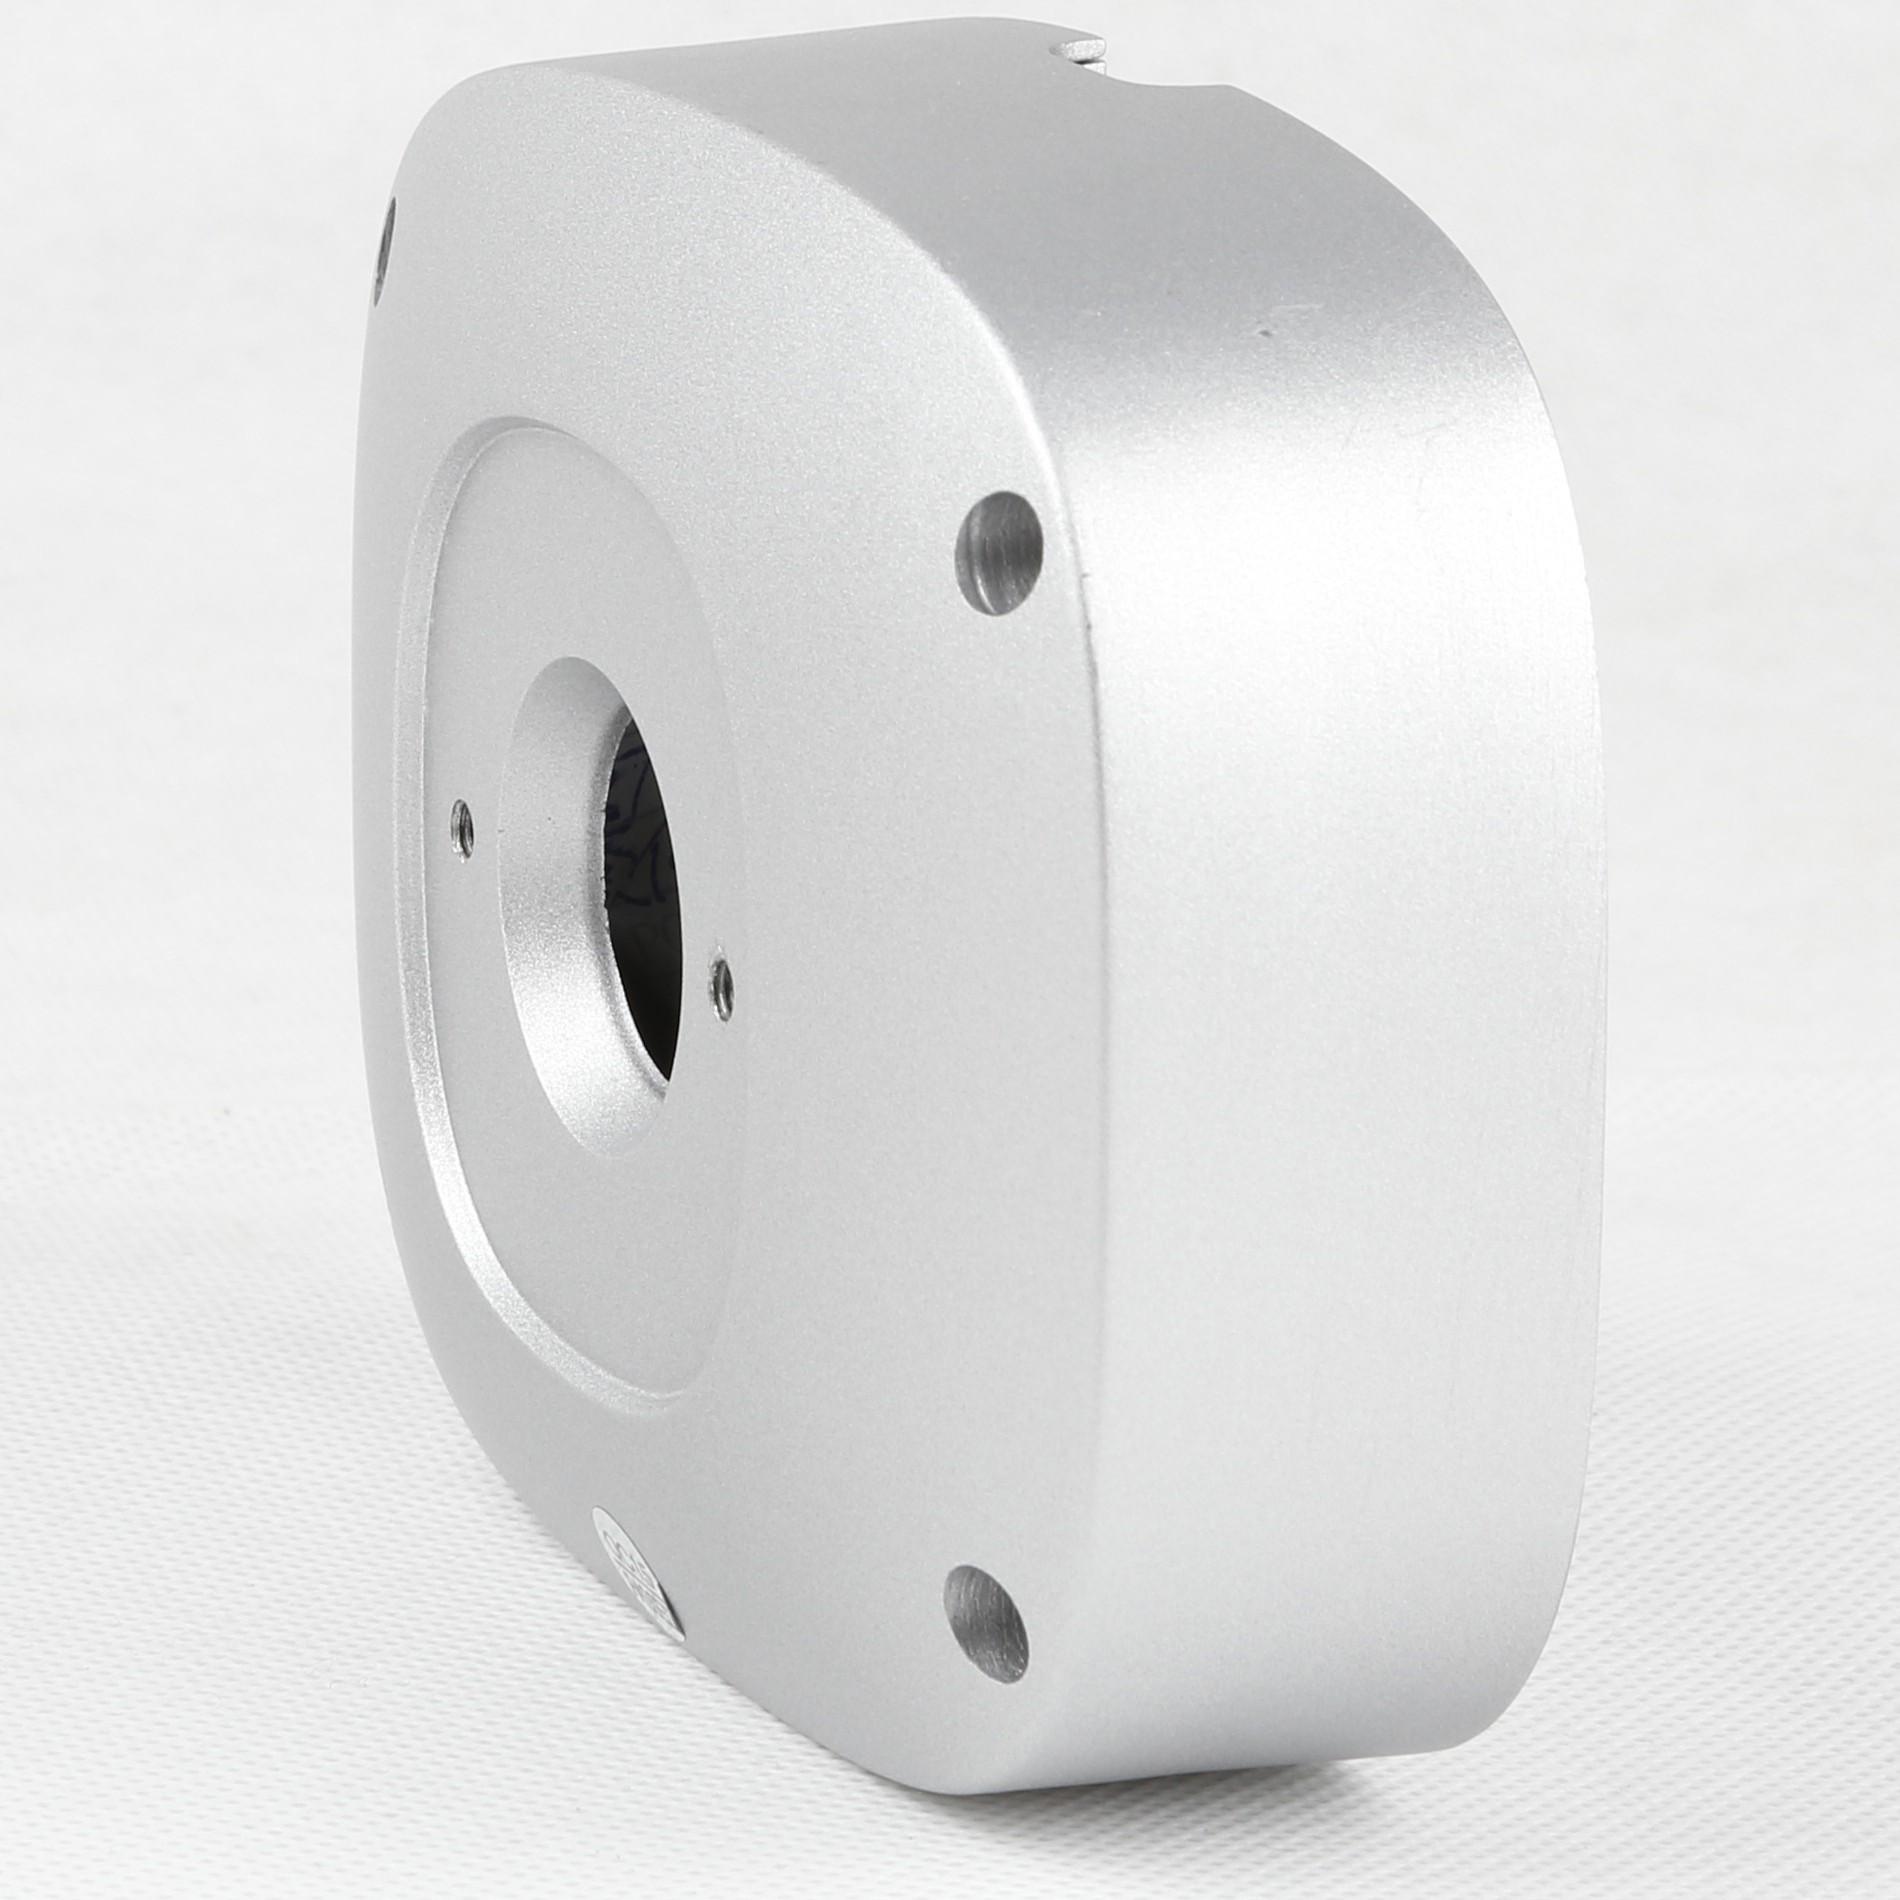 Foscam FAB99: Αδιάβροχο κουτί διακλάδωσης